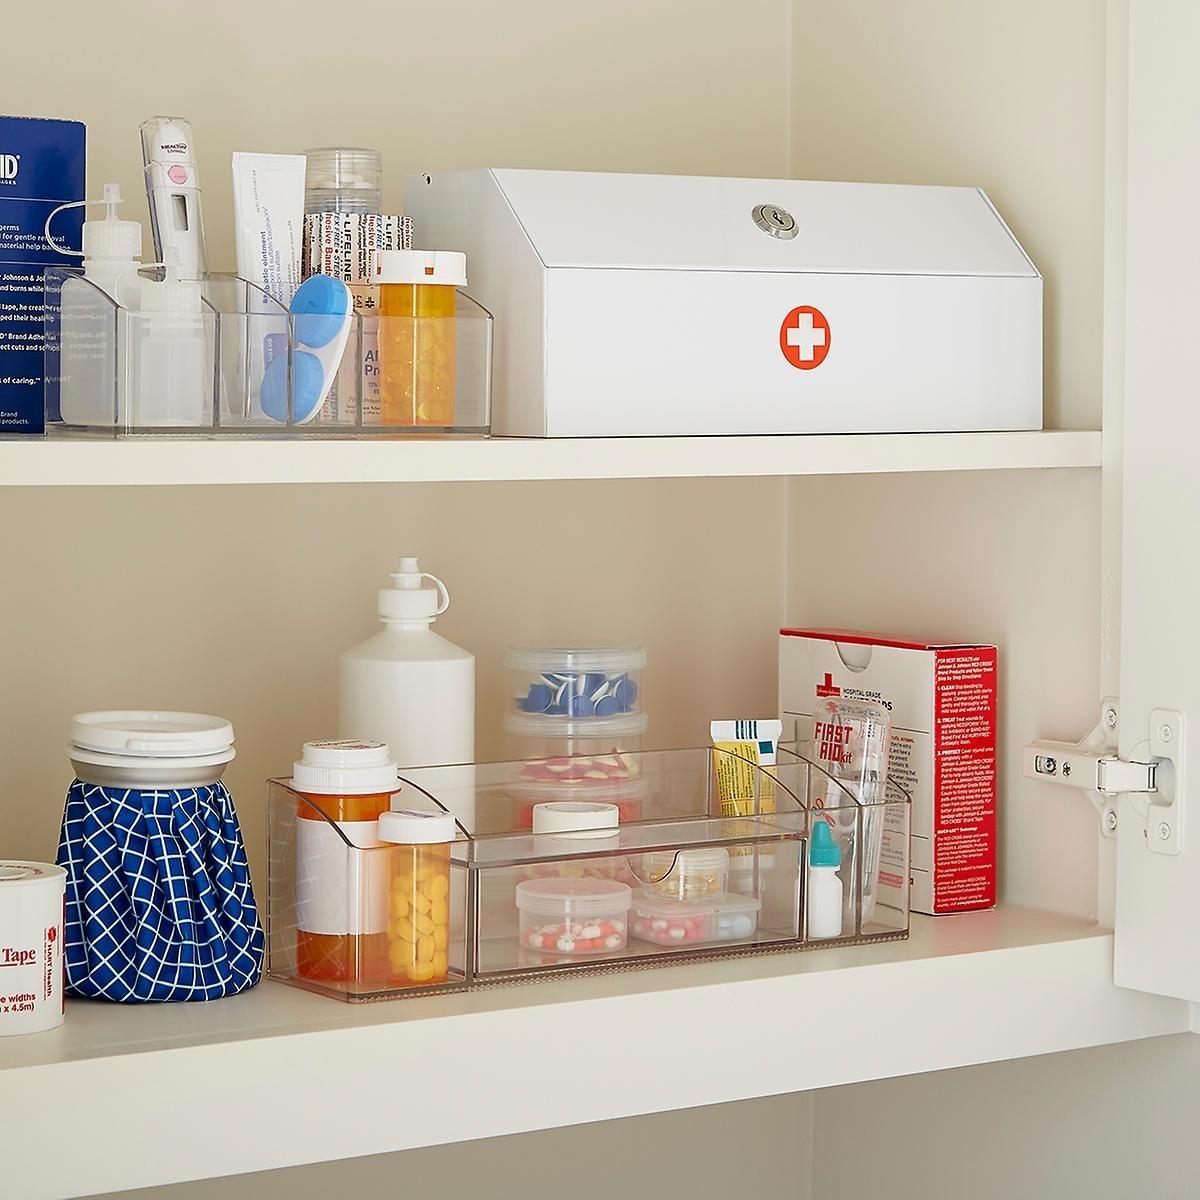 open view of a medicine cabinet with a lockable medicine storage box